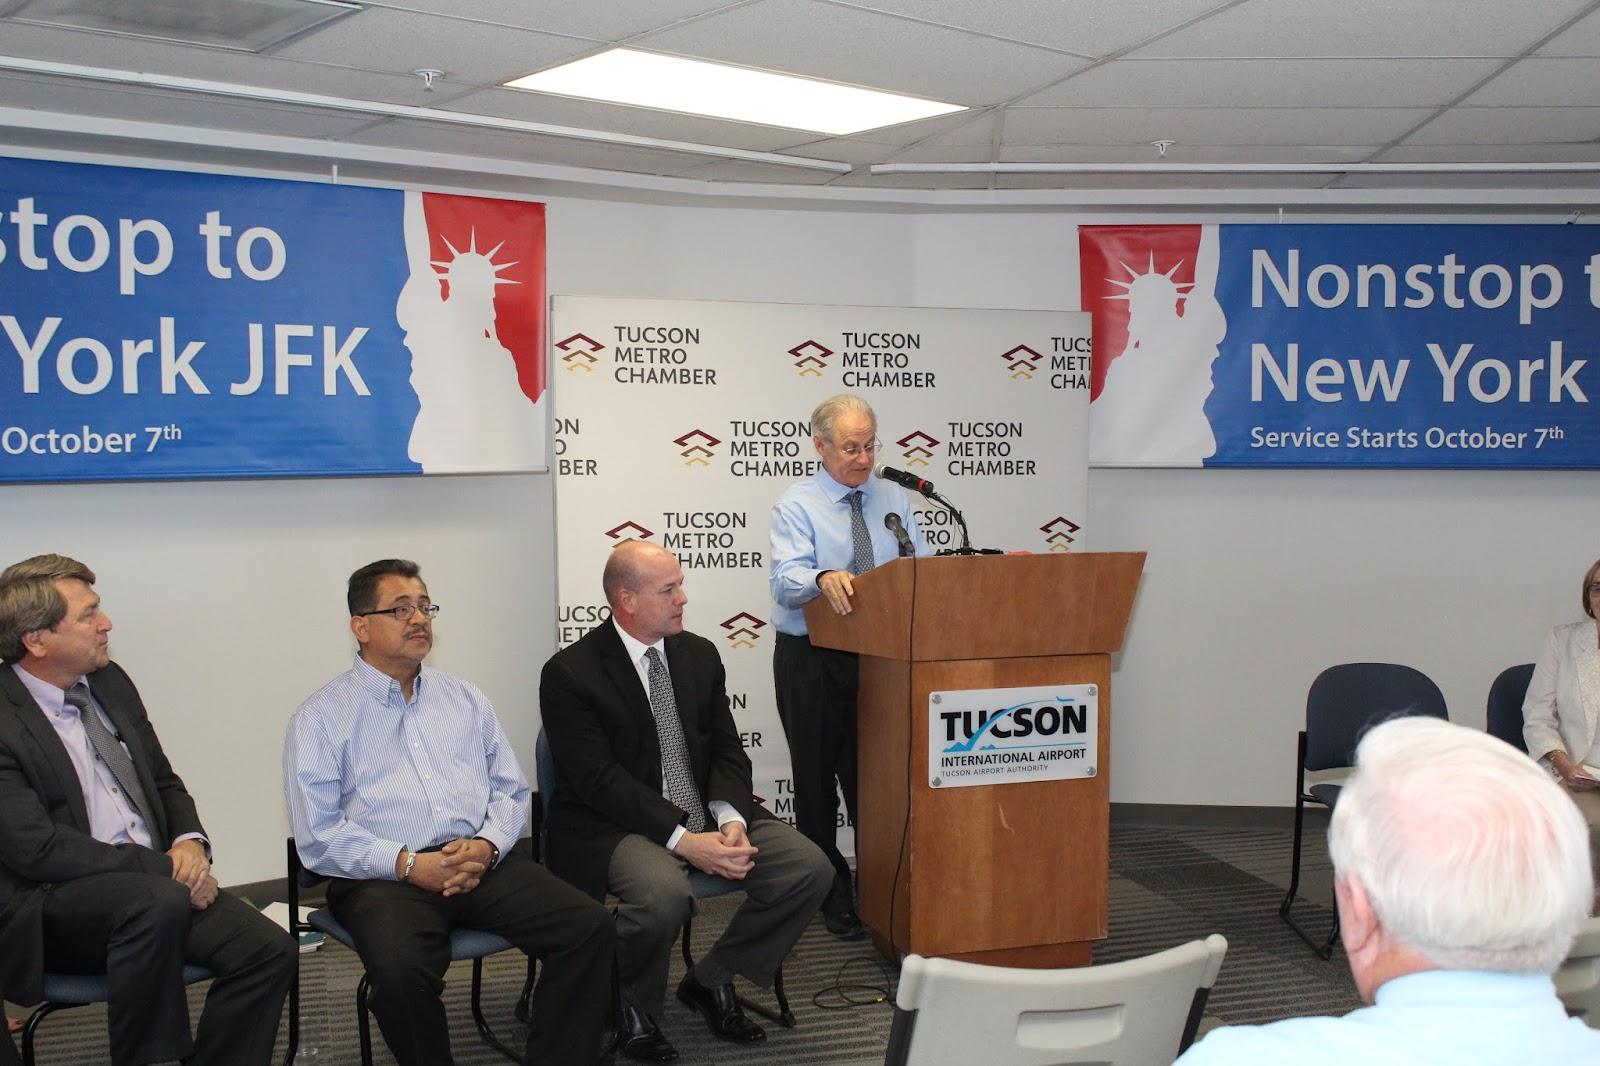 Tucson - JFK Non-Stop Route Announcement - IMG_3207.JPG